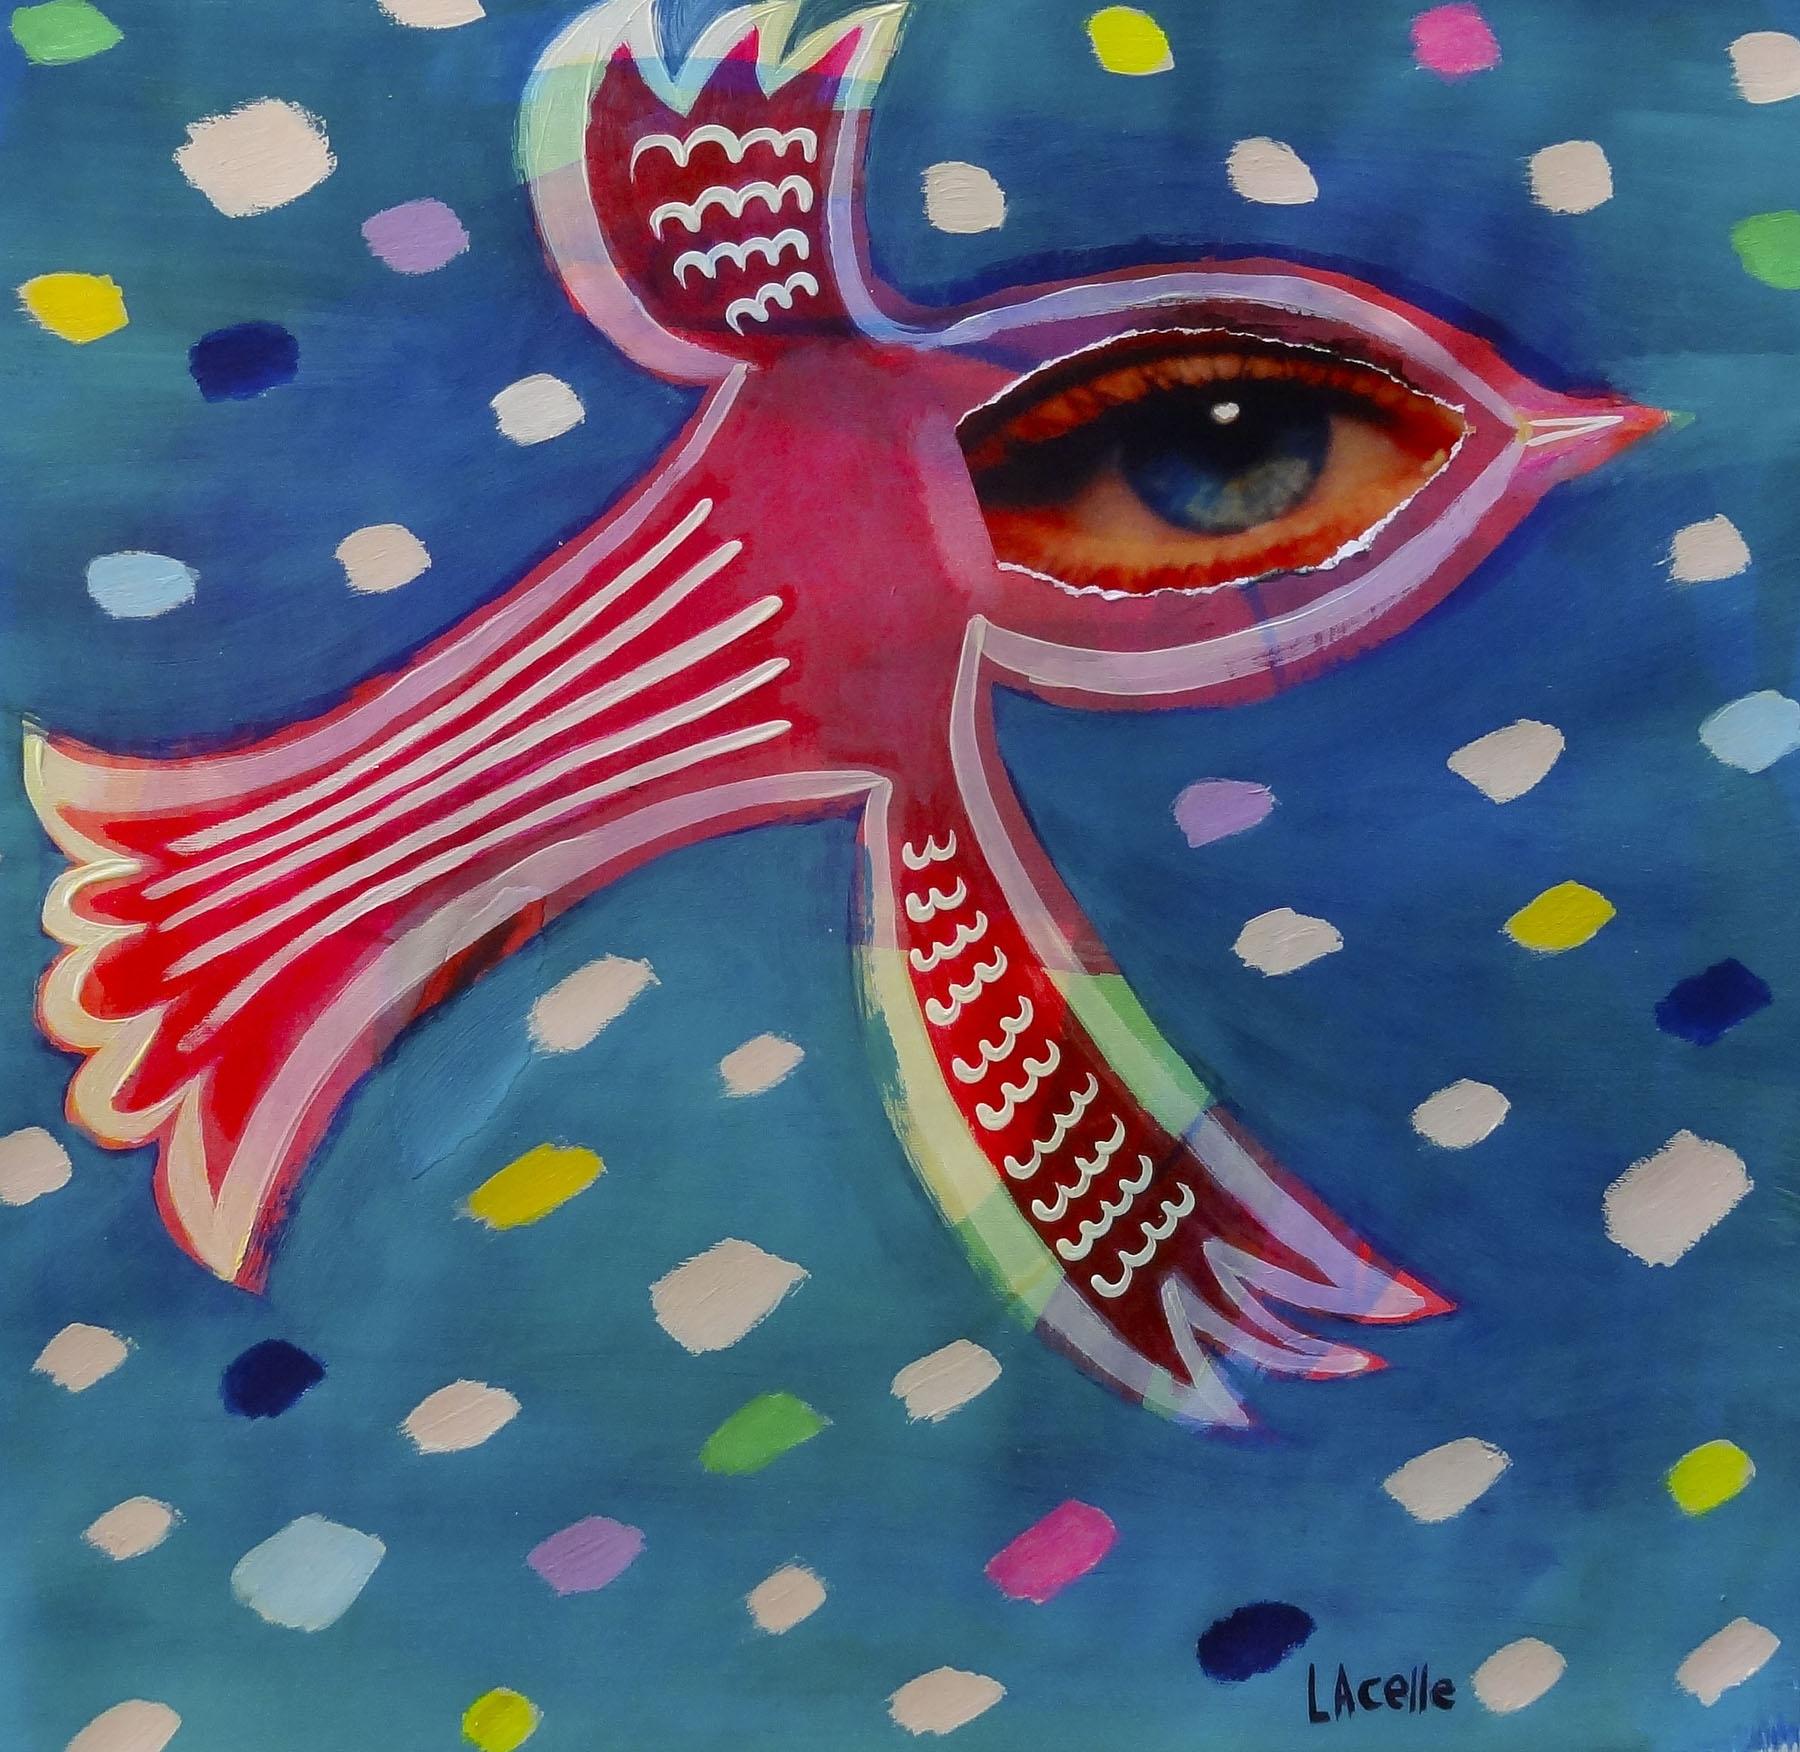 Confetti Sky #2 by Helene Lacelle